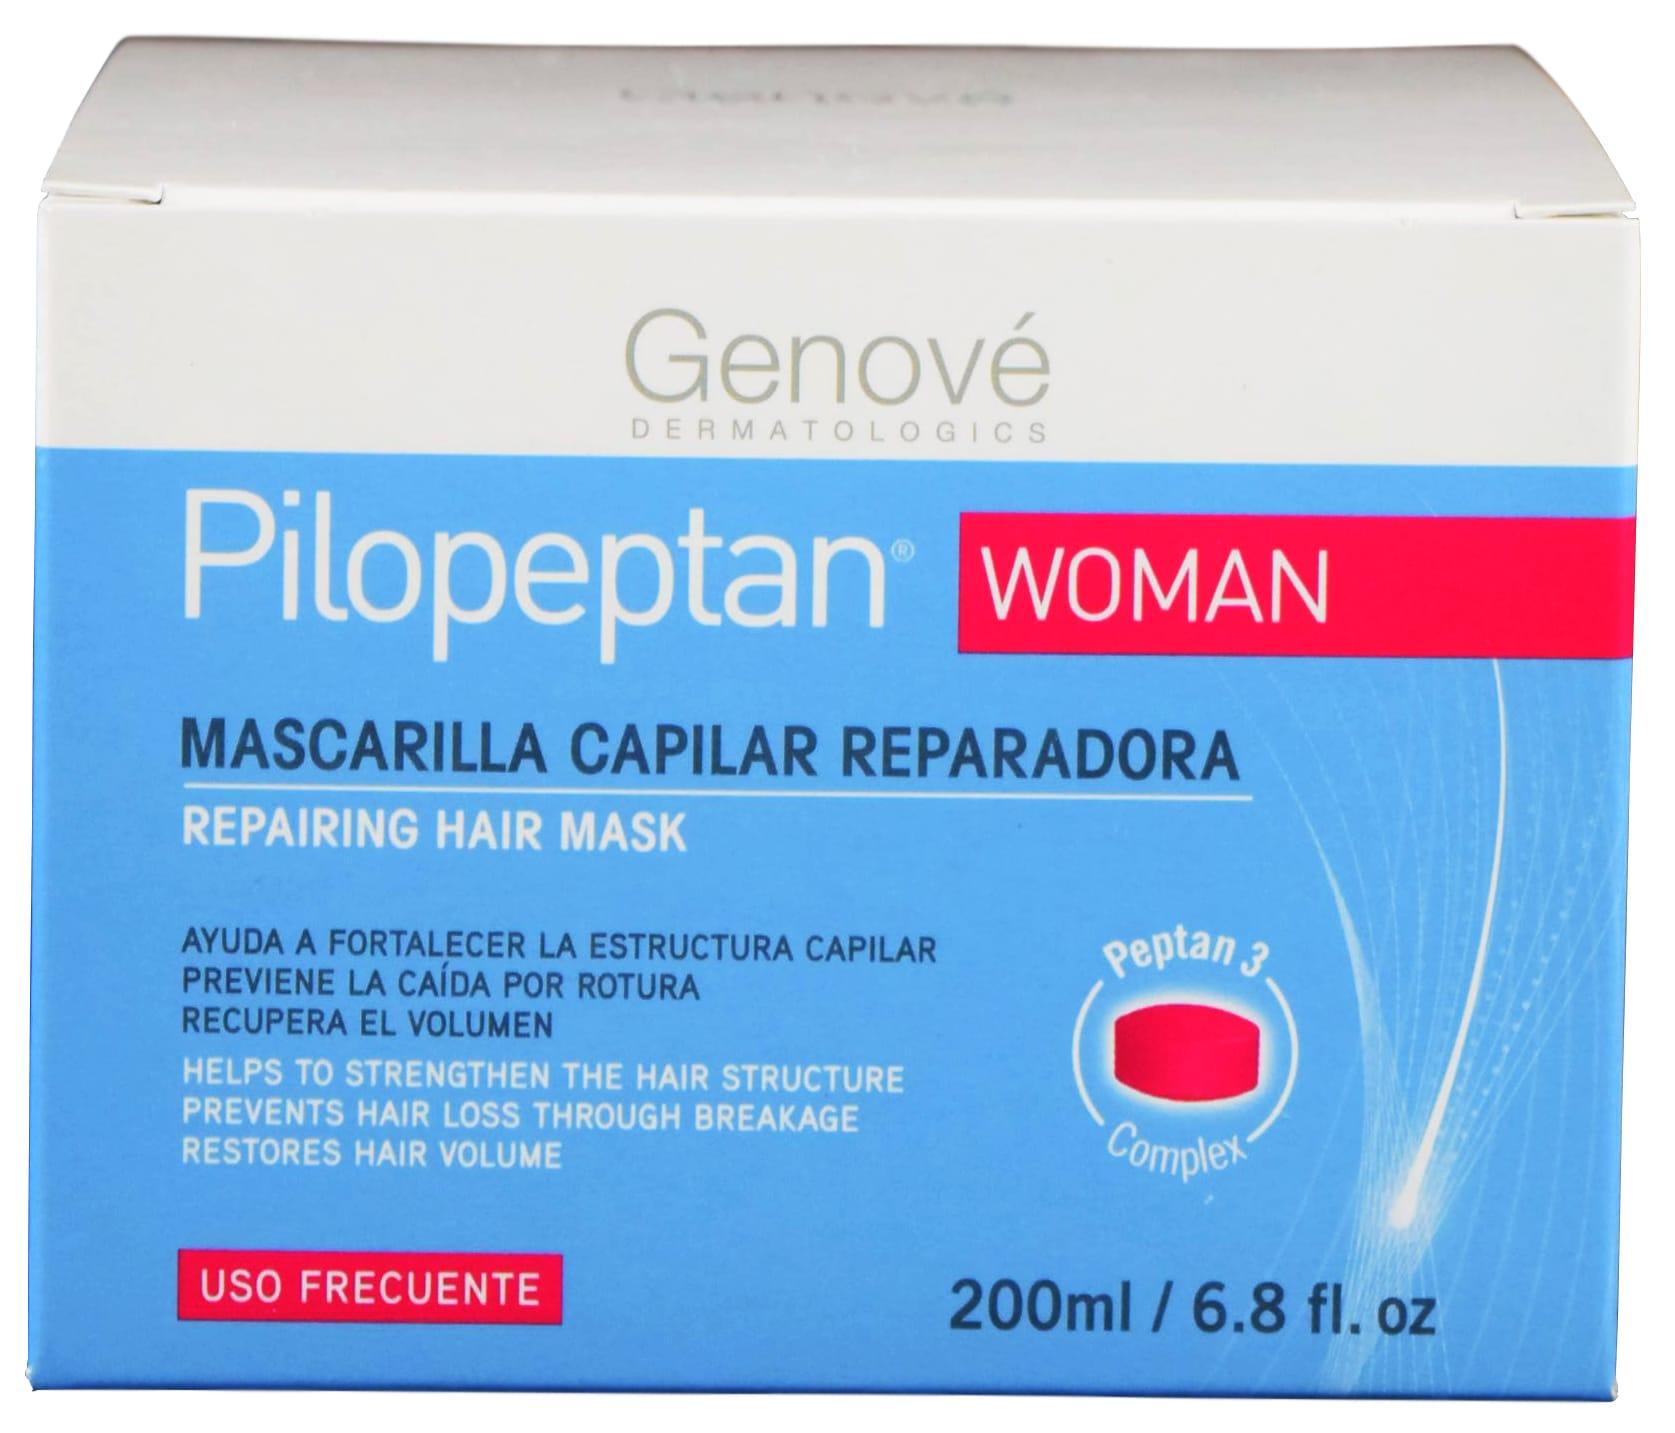 Comprar Pilopeptan Masc Capilar Regeneradora Woman 1 Frasco 200 Ml